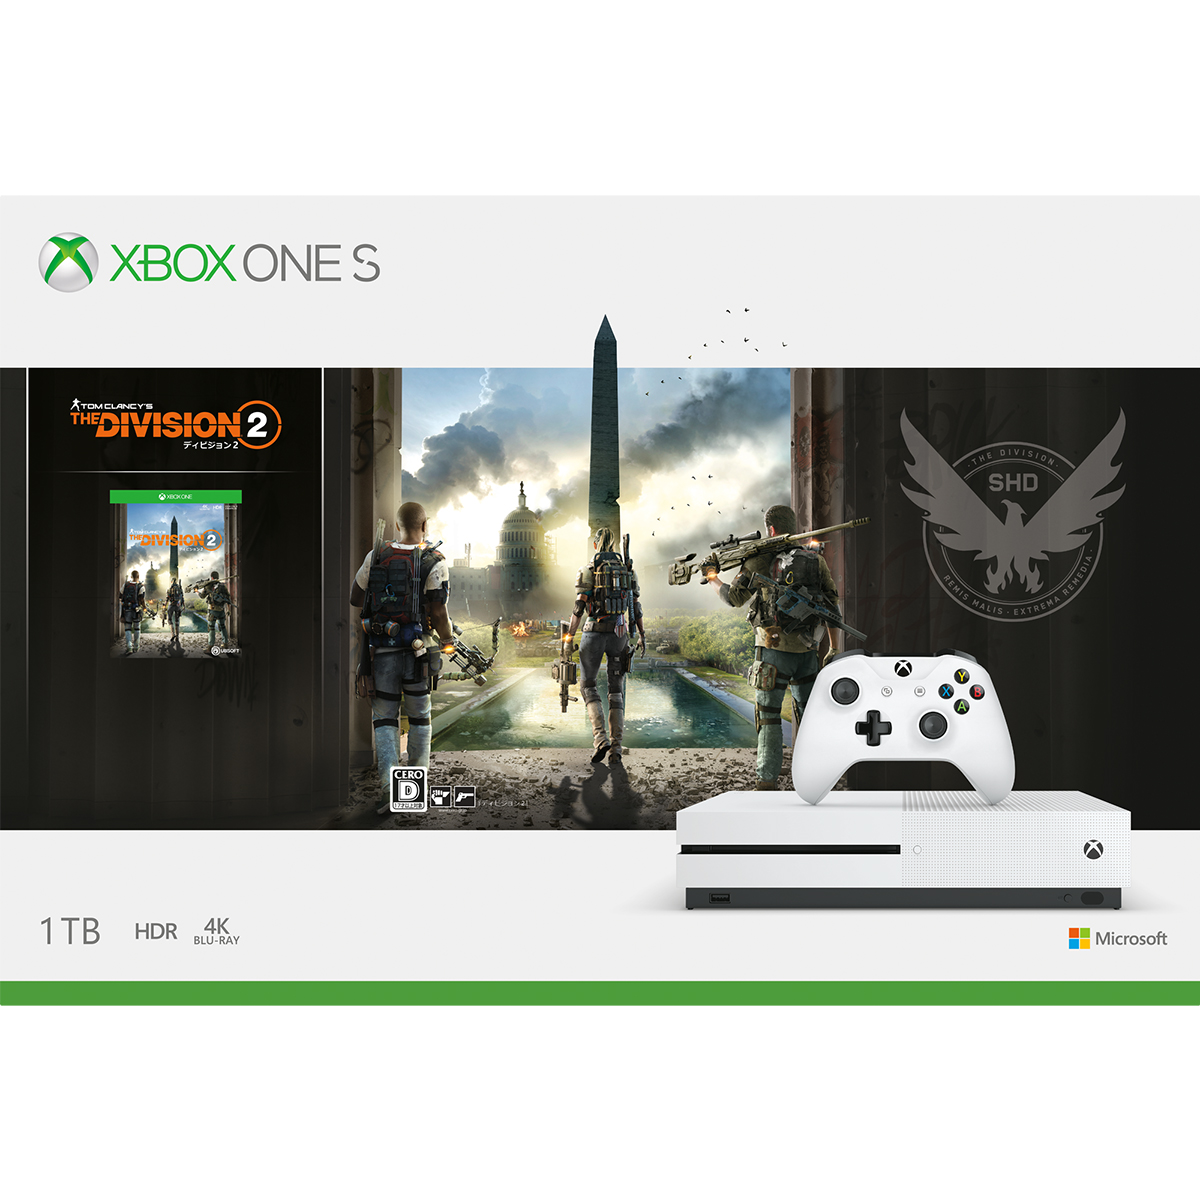 Xbox One S 1 TB (ディビジョン2 同梱版)